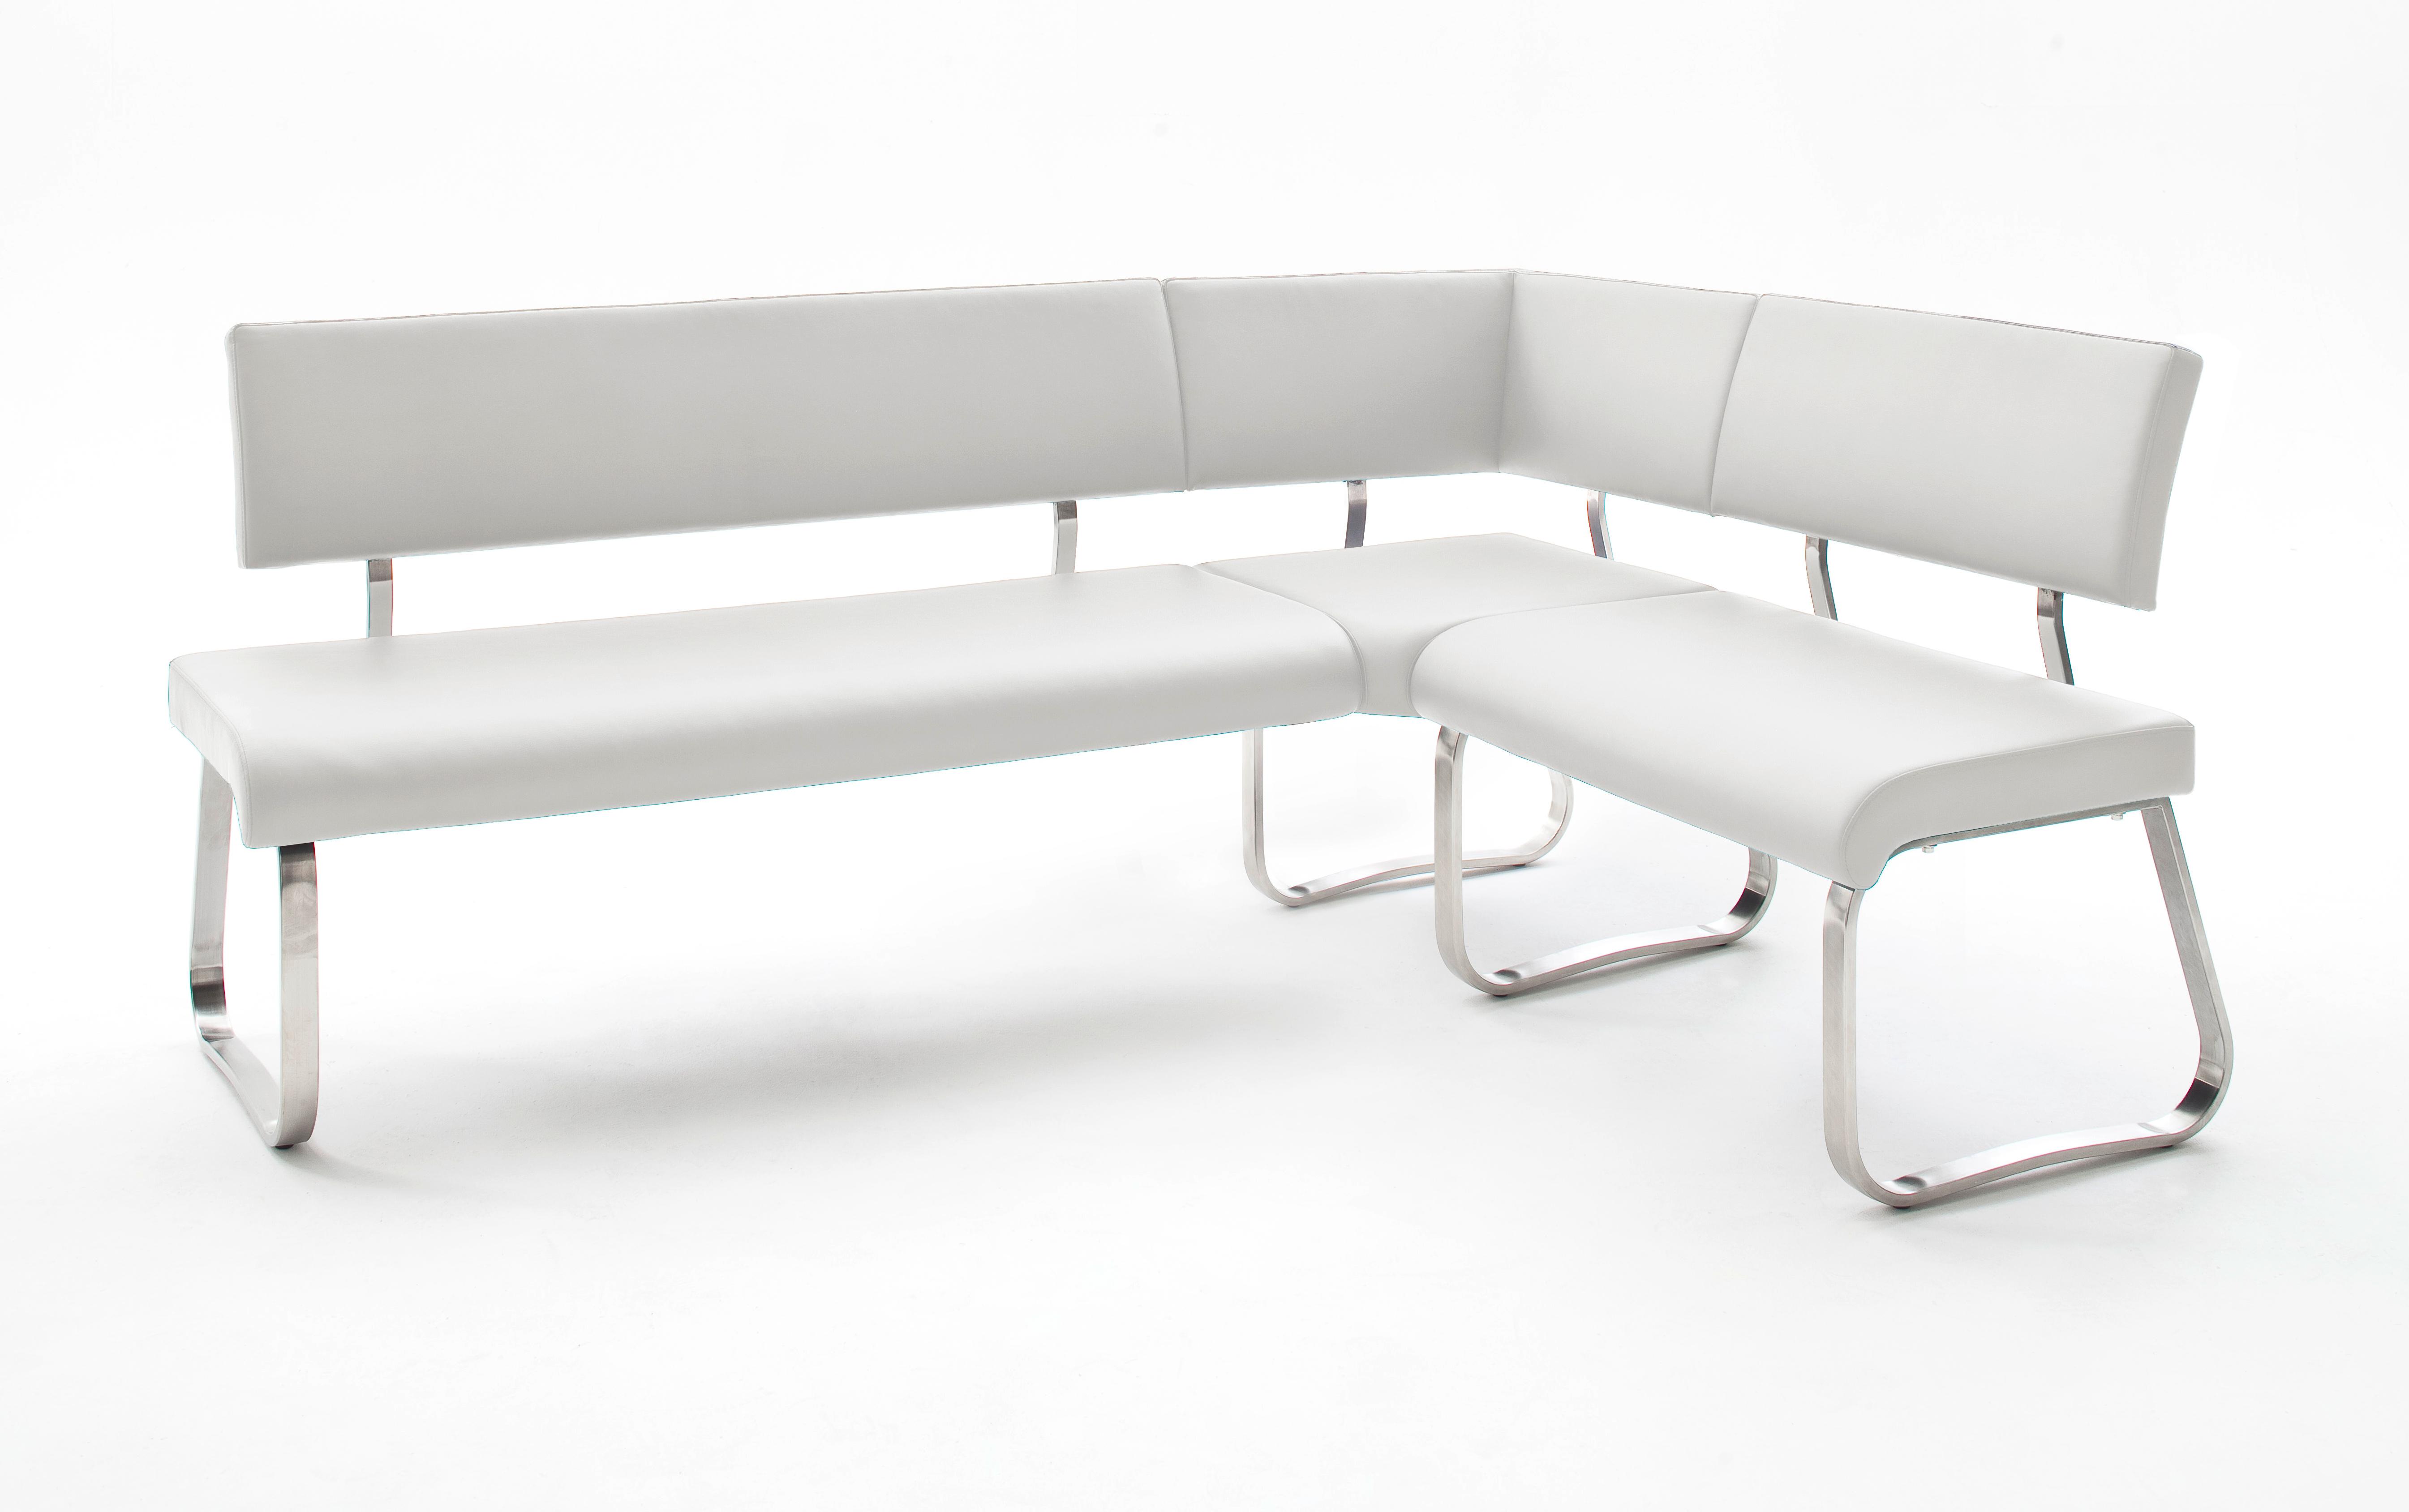 Eckbank Arco Weiss Kunstleder 200 X 150 Cm